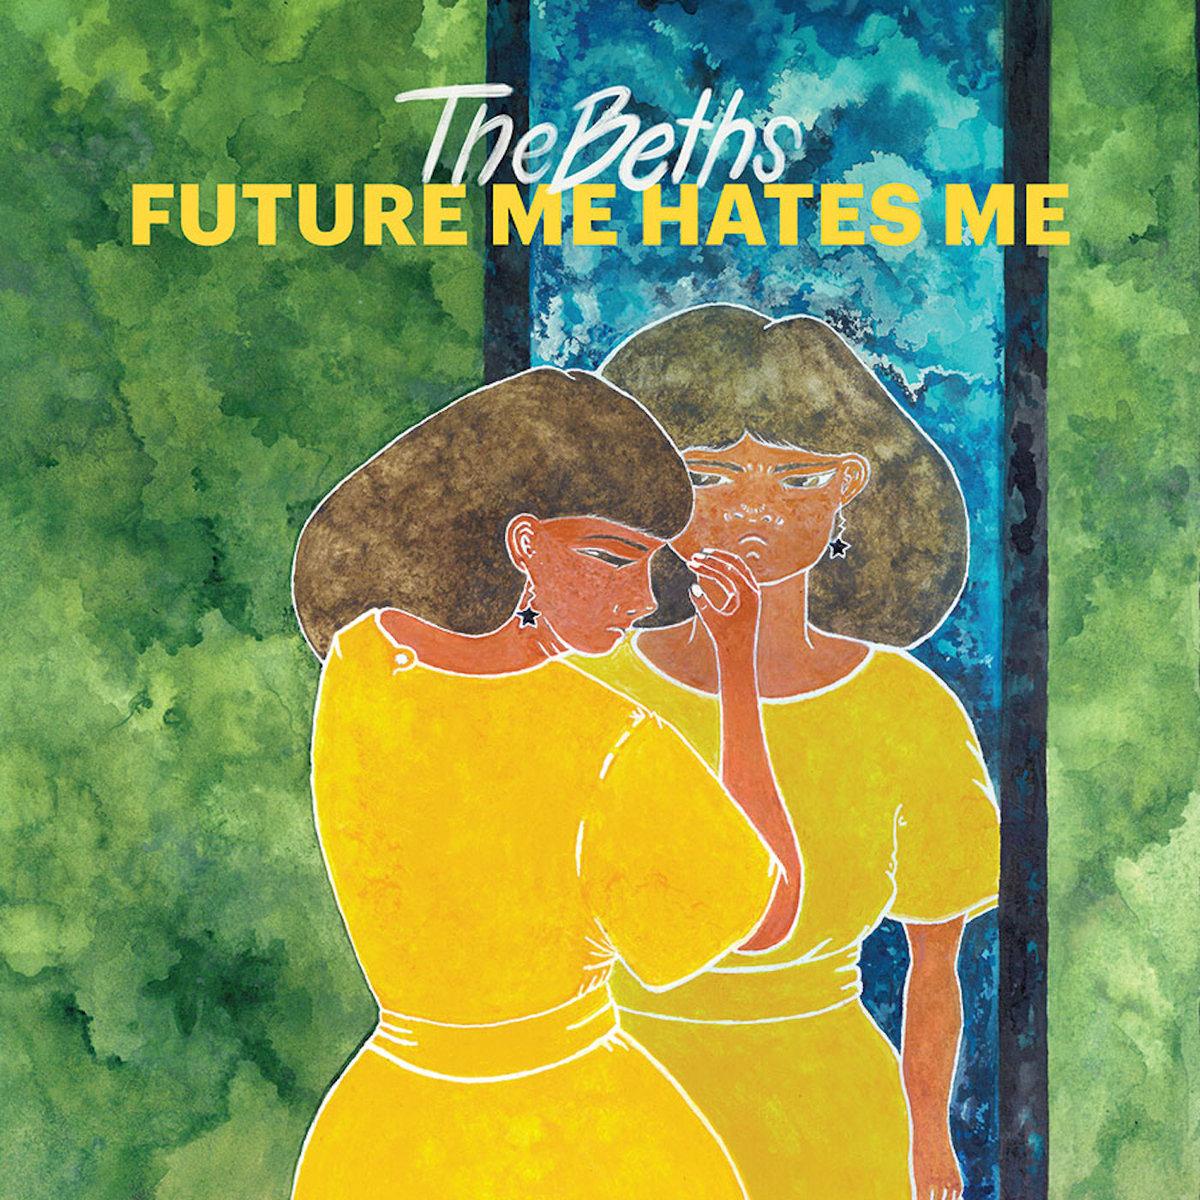 The Beths Future Me Hates Me